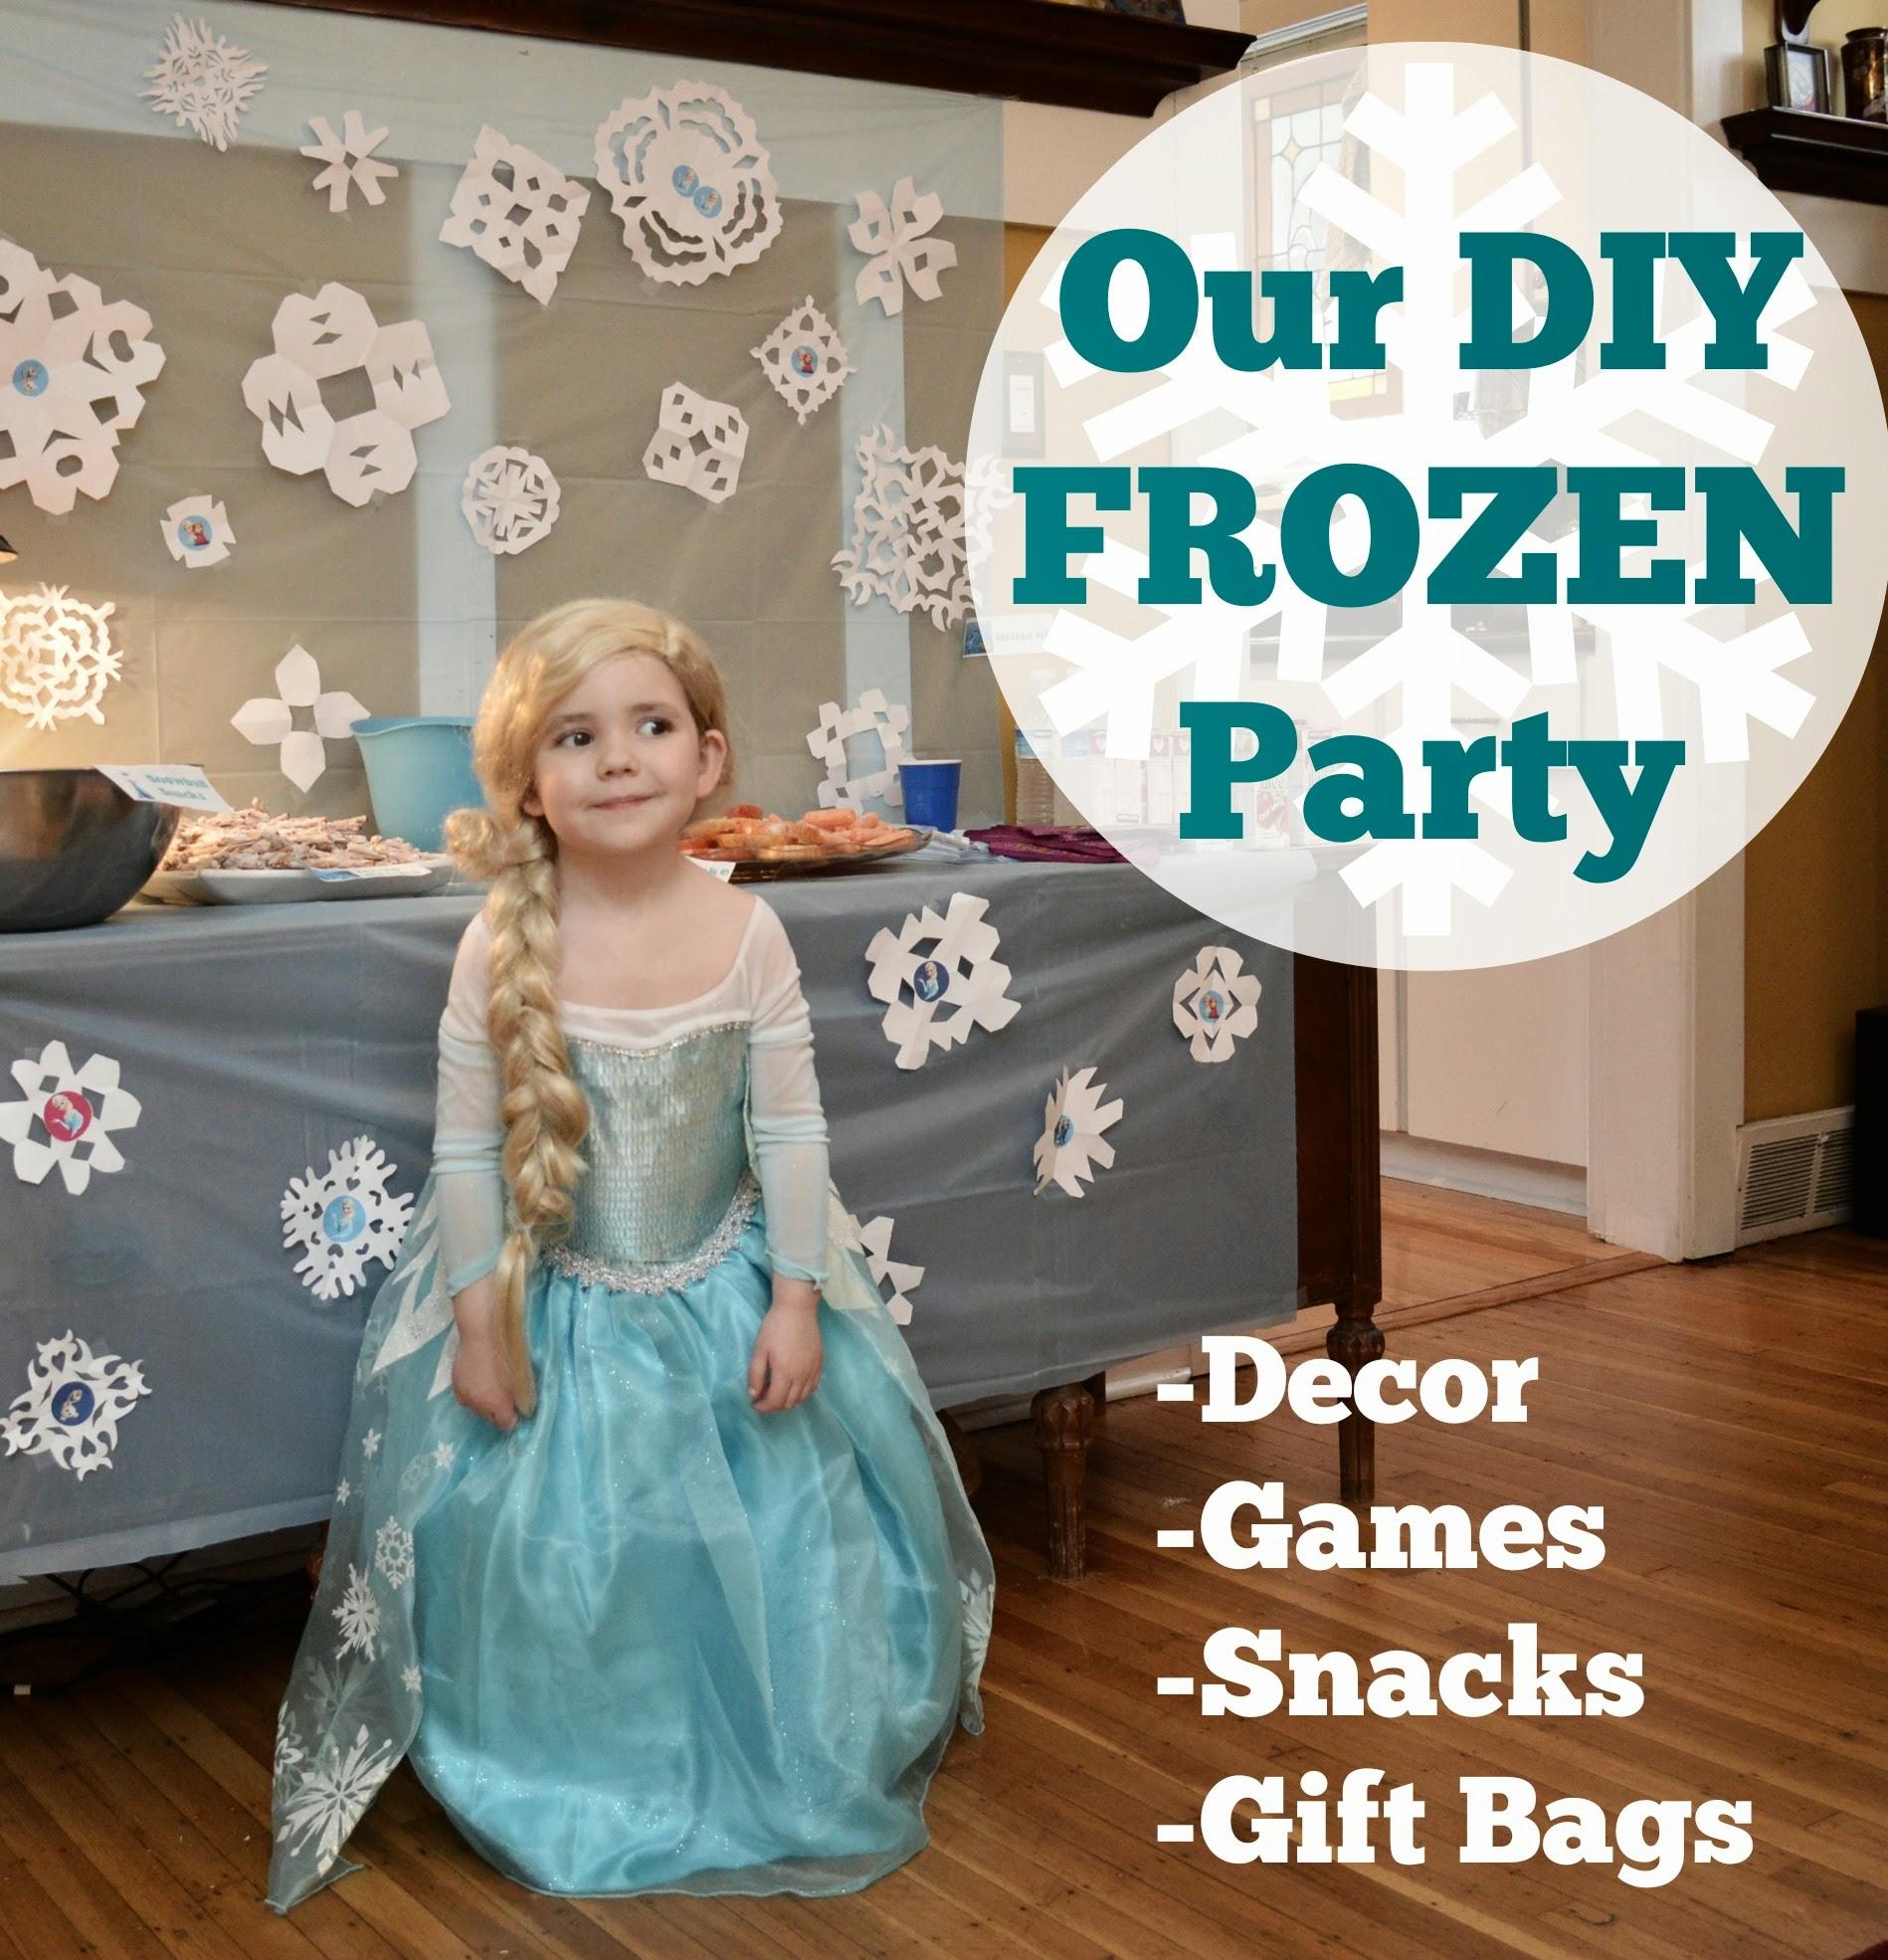 Beth Being Crafty: The DIY Frozen Birthday